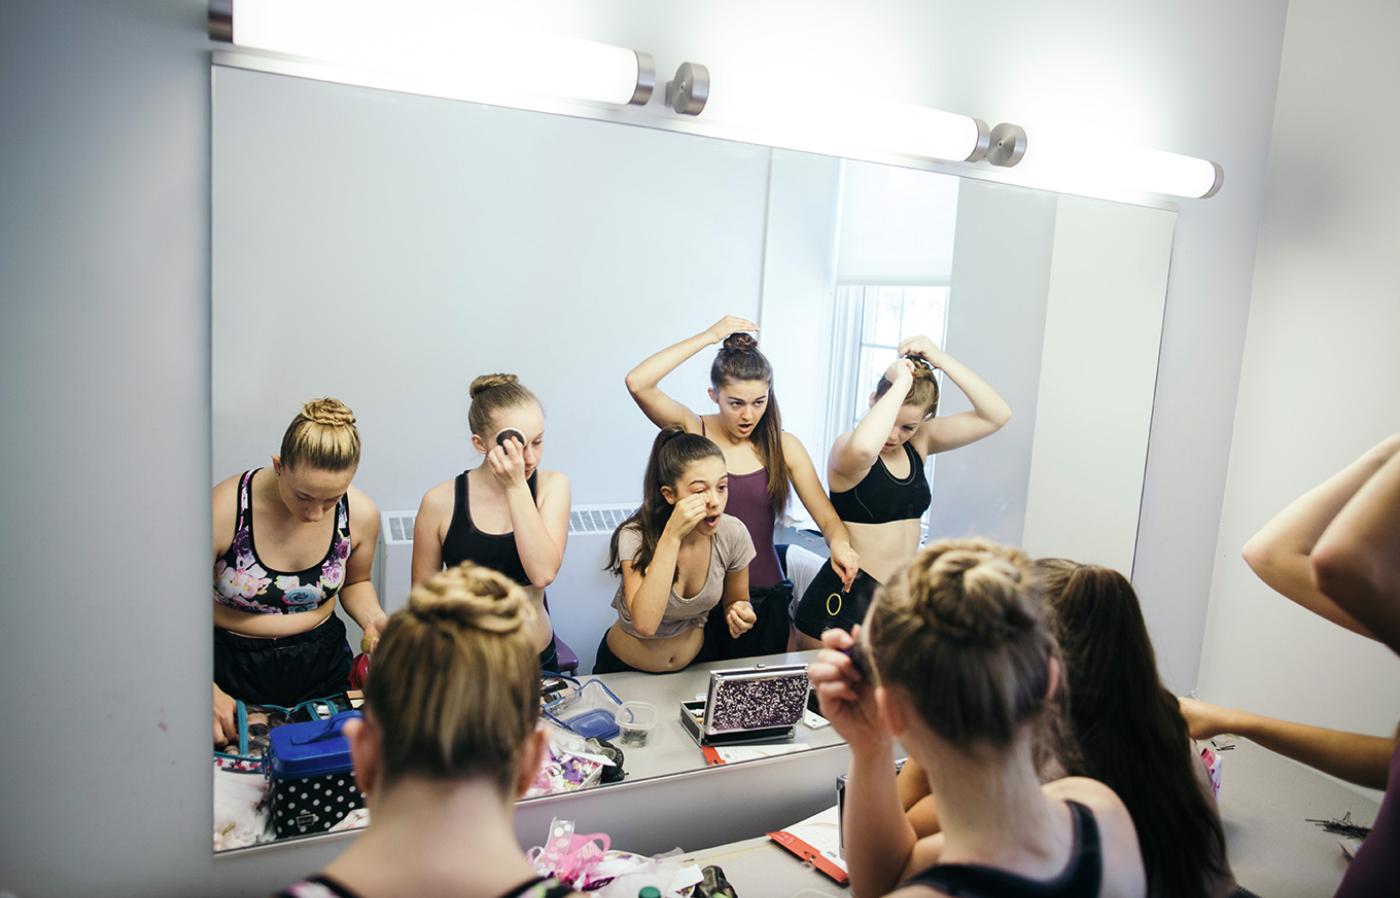 Ballet dancers putting on makeup